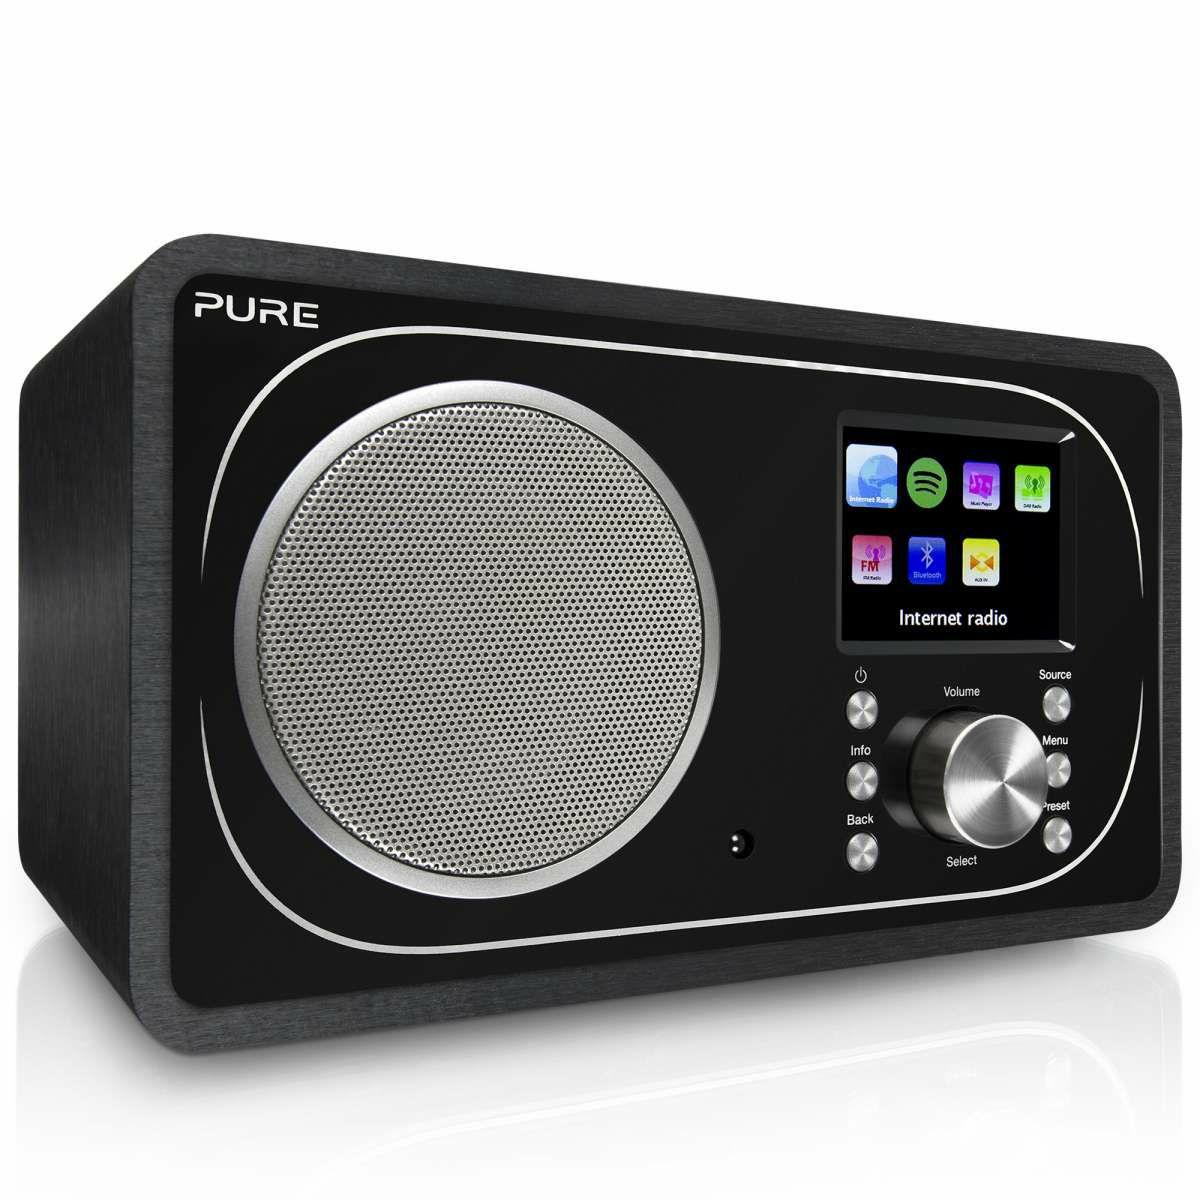 Pure Digital Evoke F3 DAB+ FM Radio with Bluetooth - £95.99 With Code @ Hughes